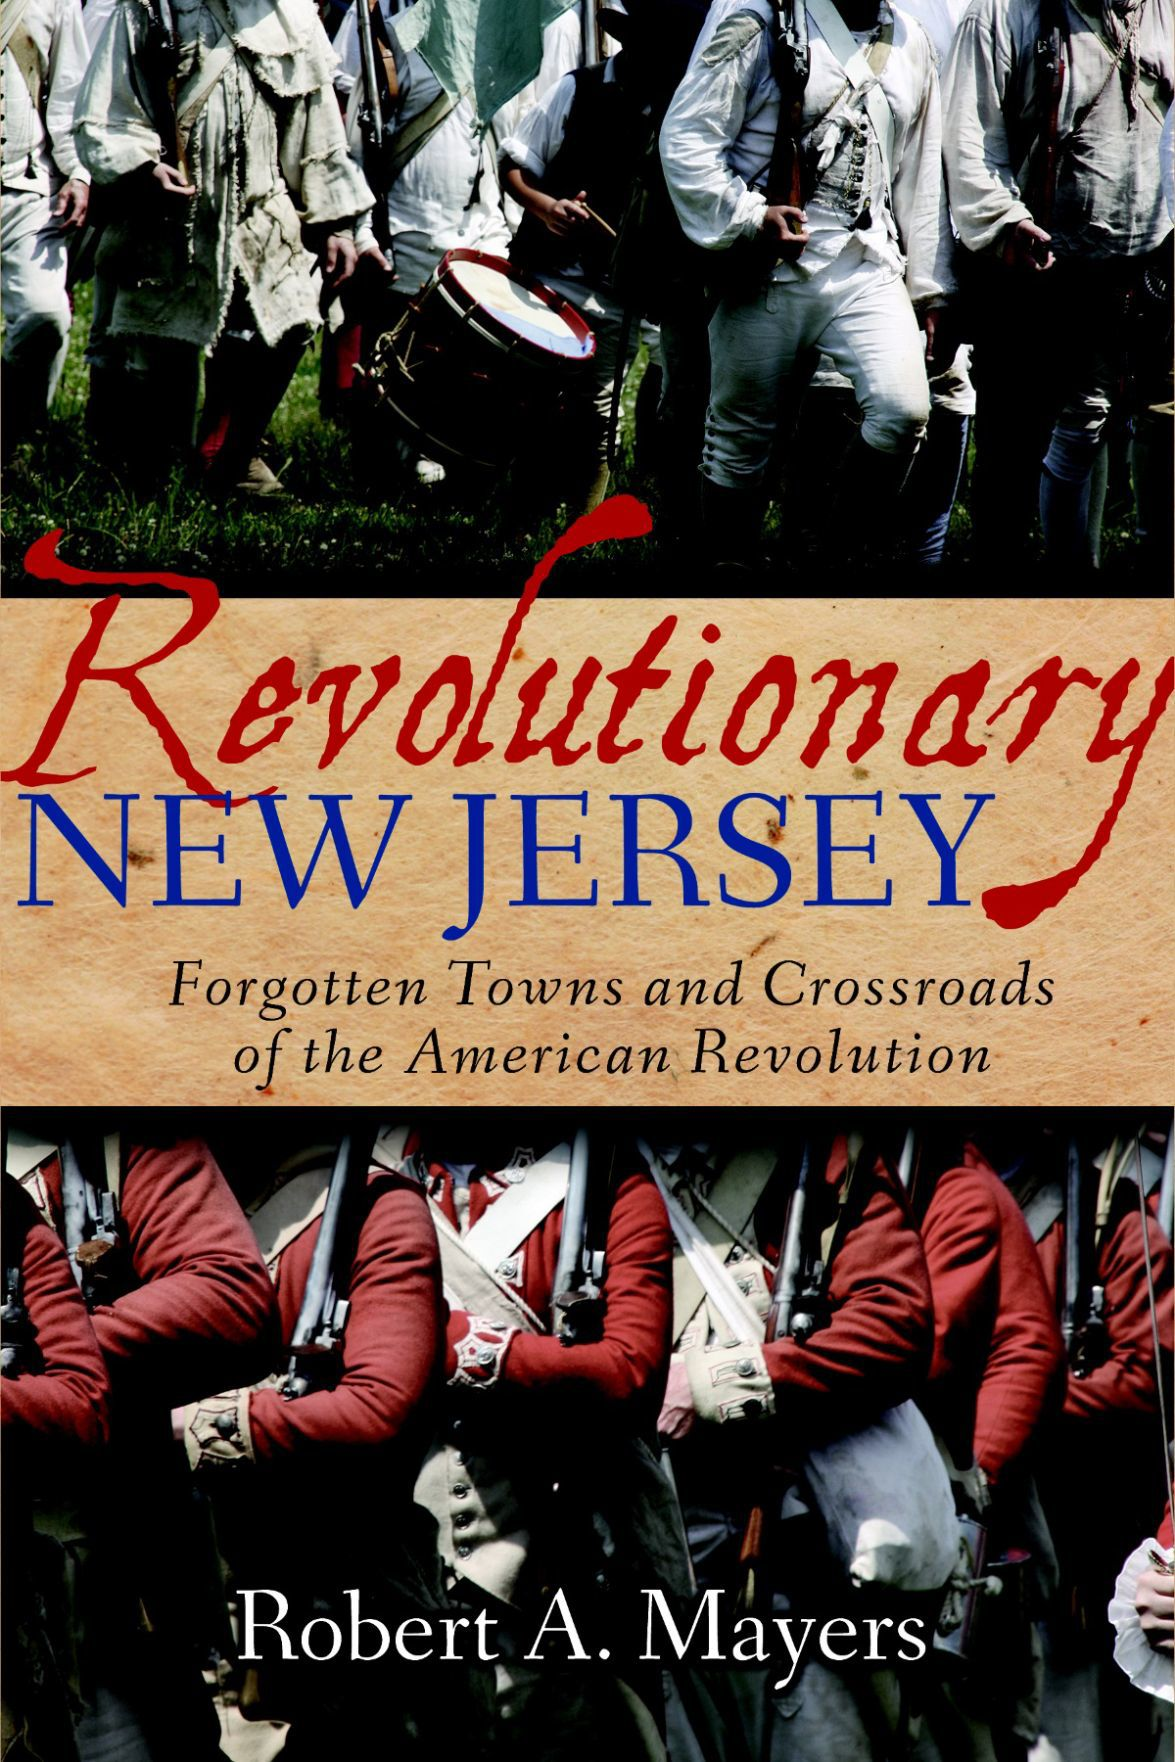 Revolutionary New Jersey by Robert Mayers